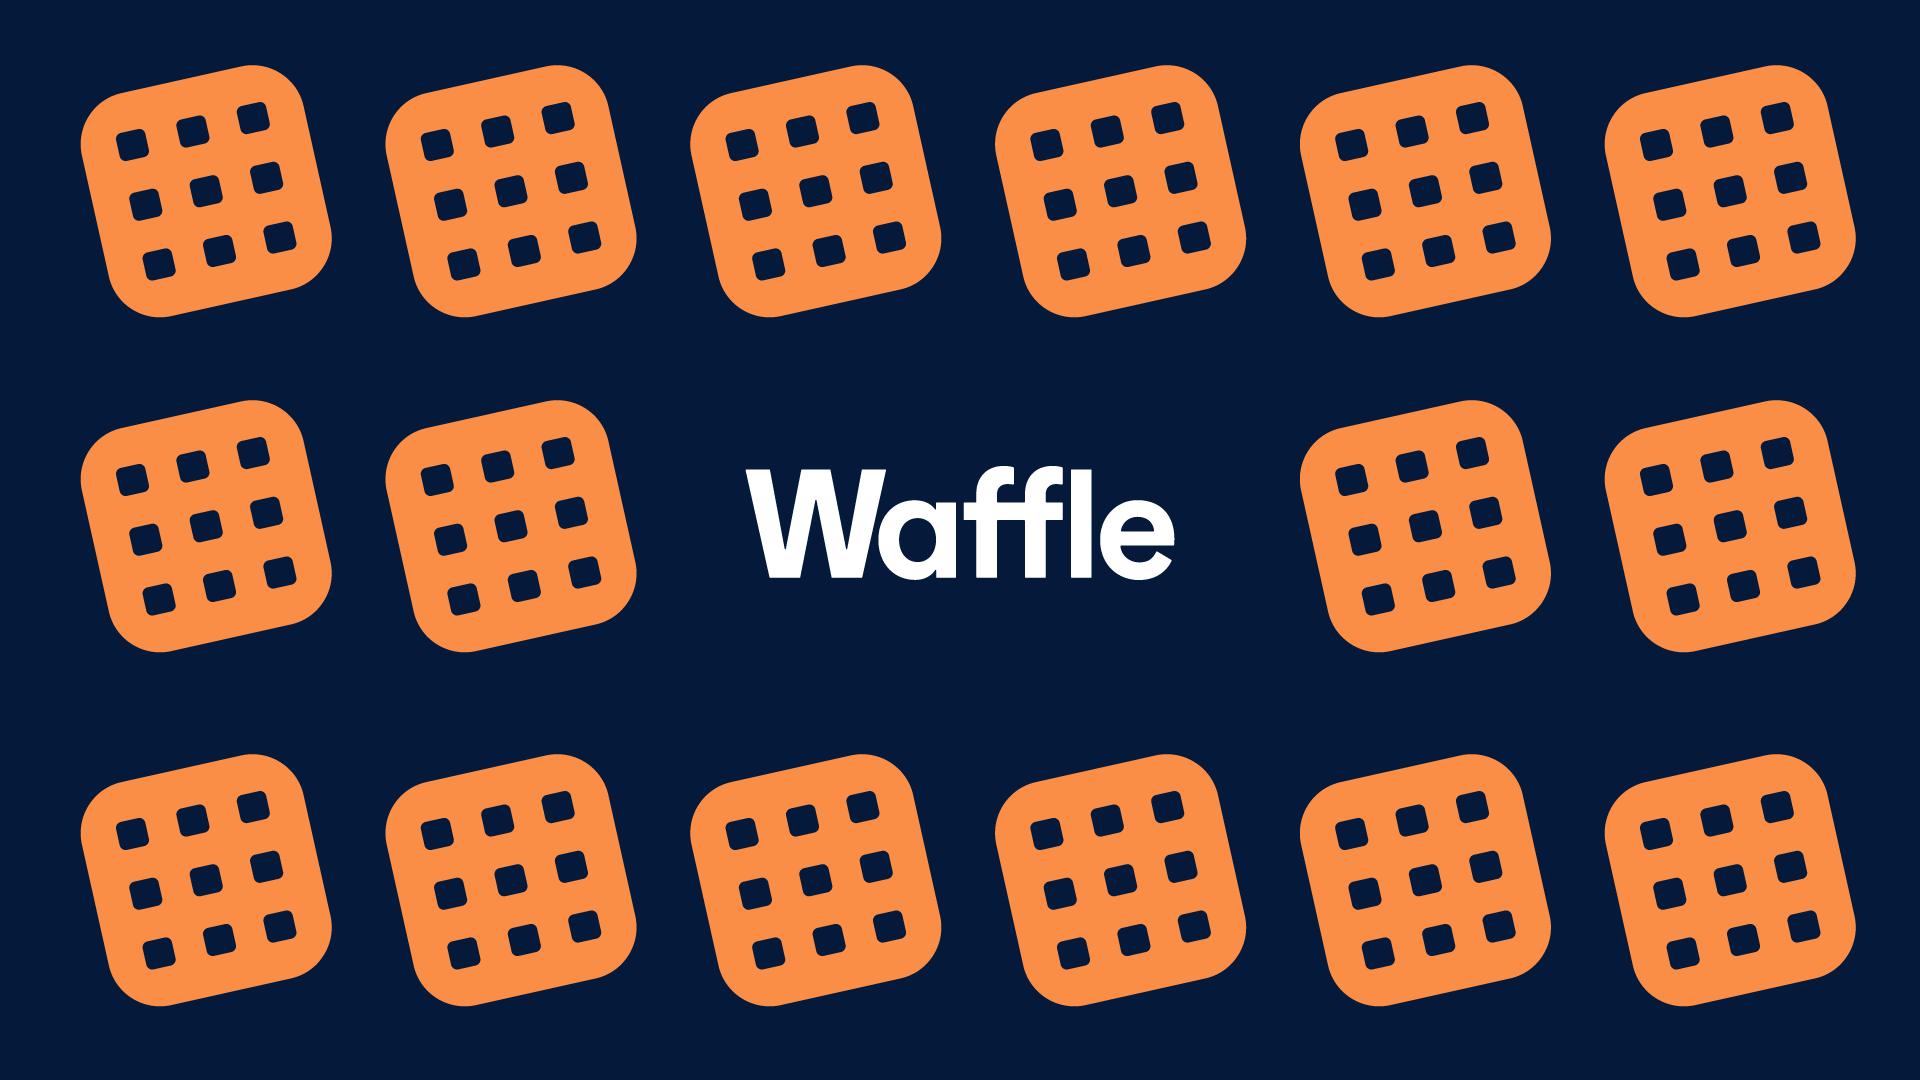 Introducing Waffle